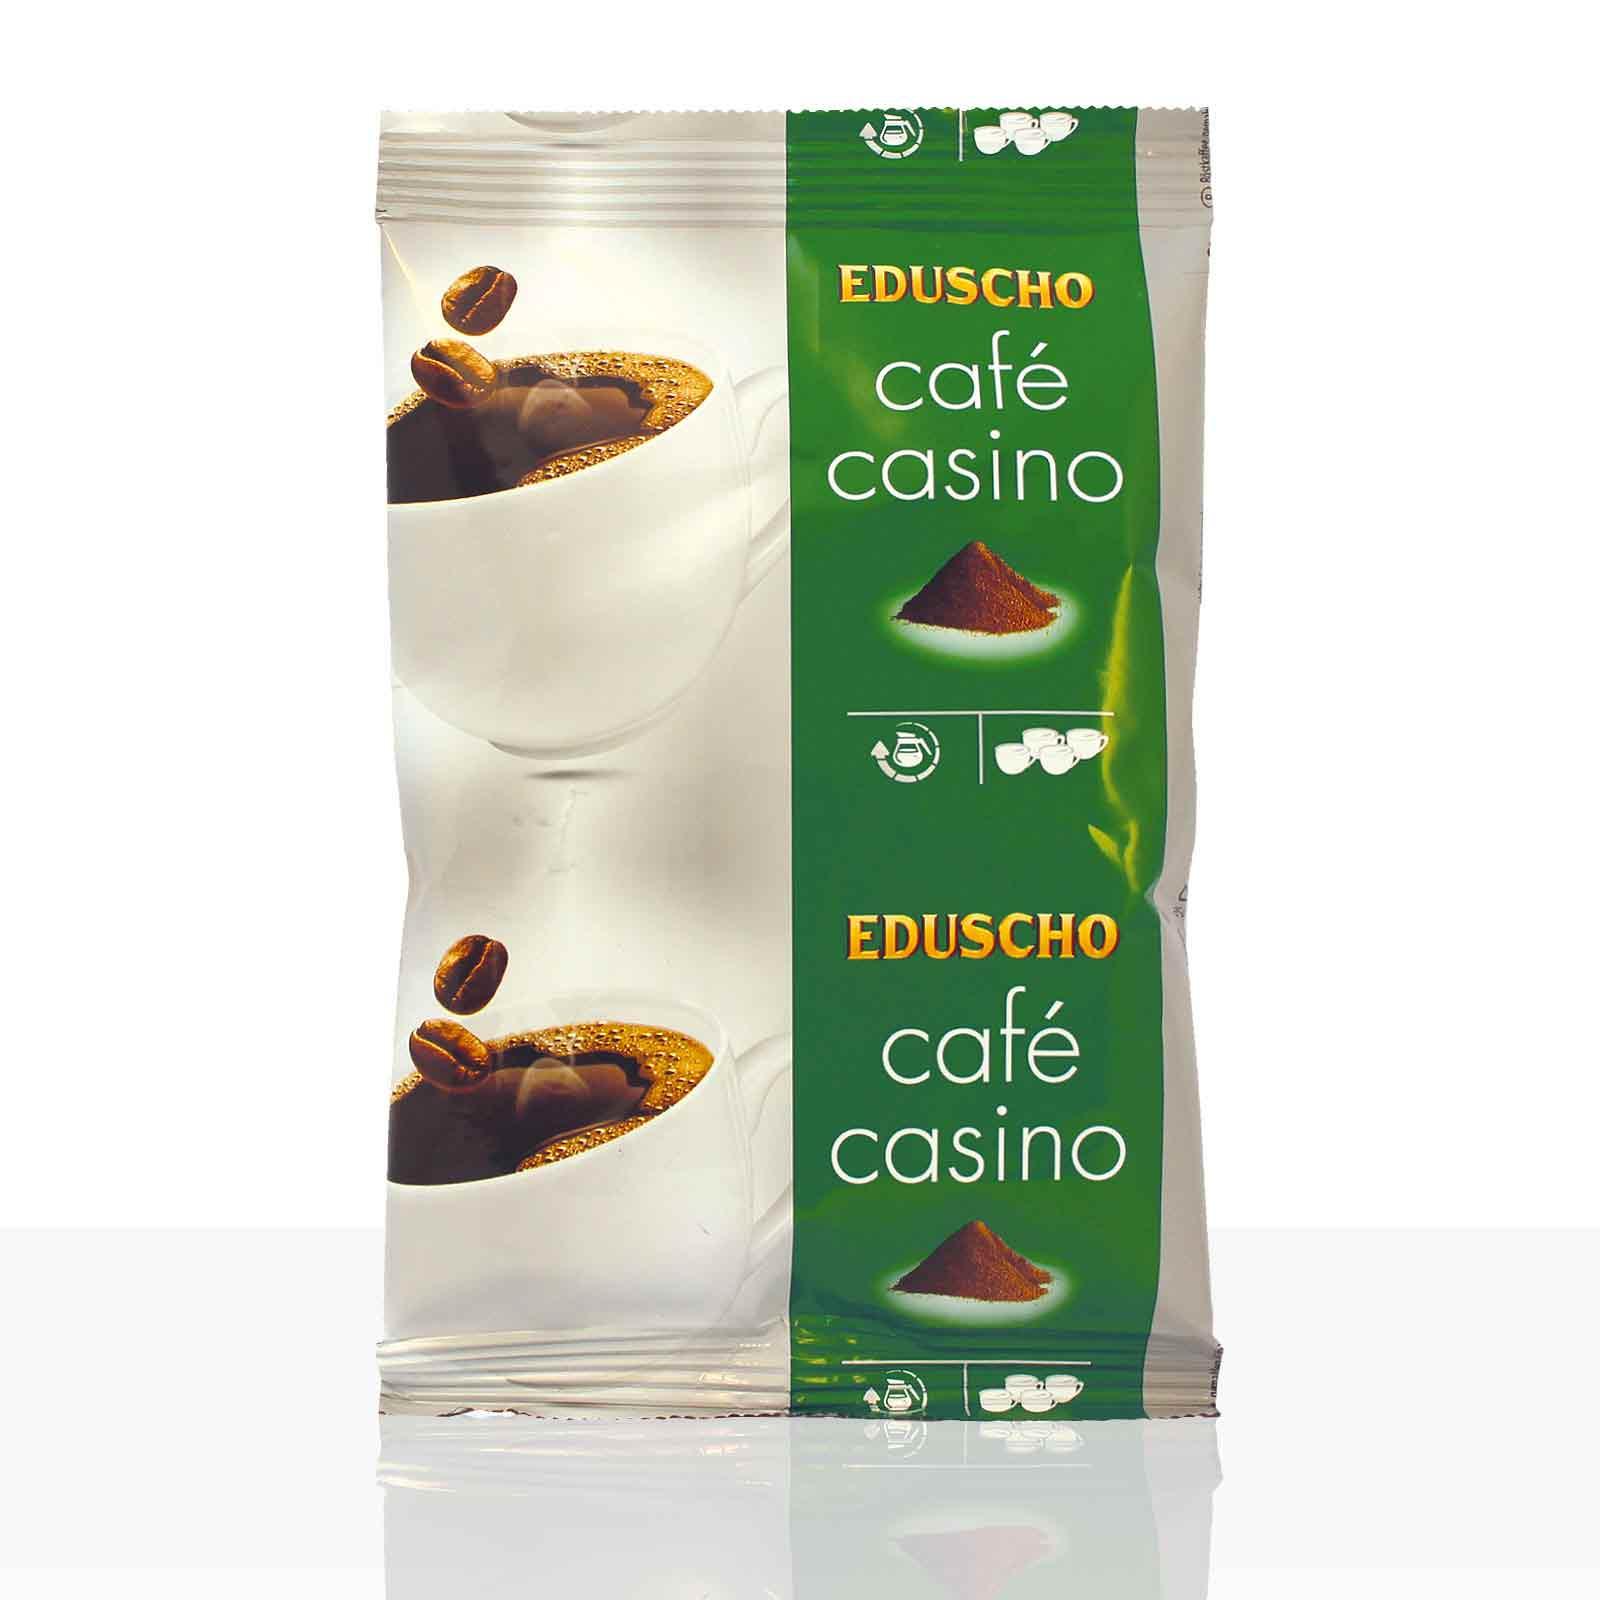 Tchibo / Eduscho Cafe Casino Plus - 80 x 60g Kaffee gemahlen, Filterkaffee